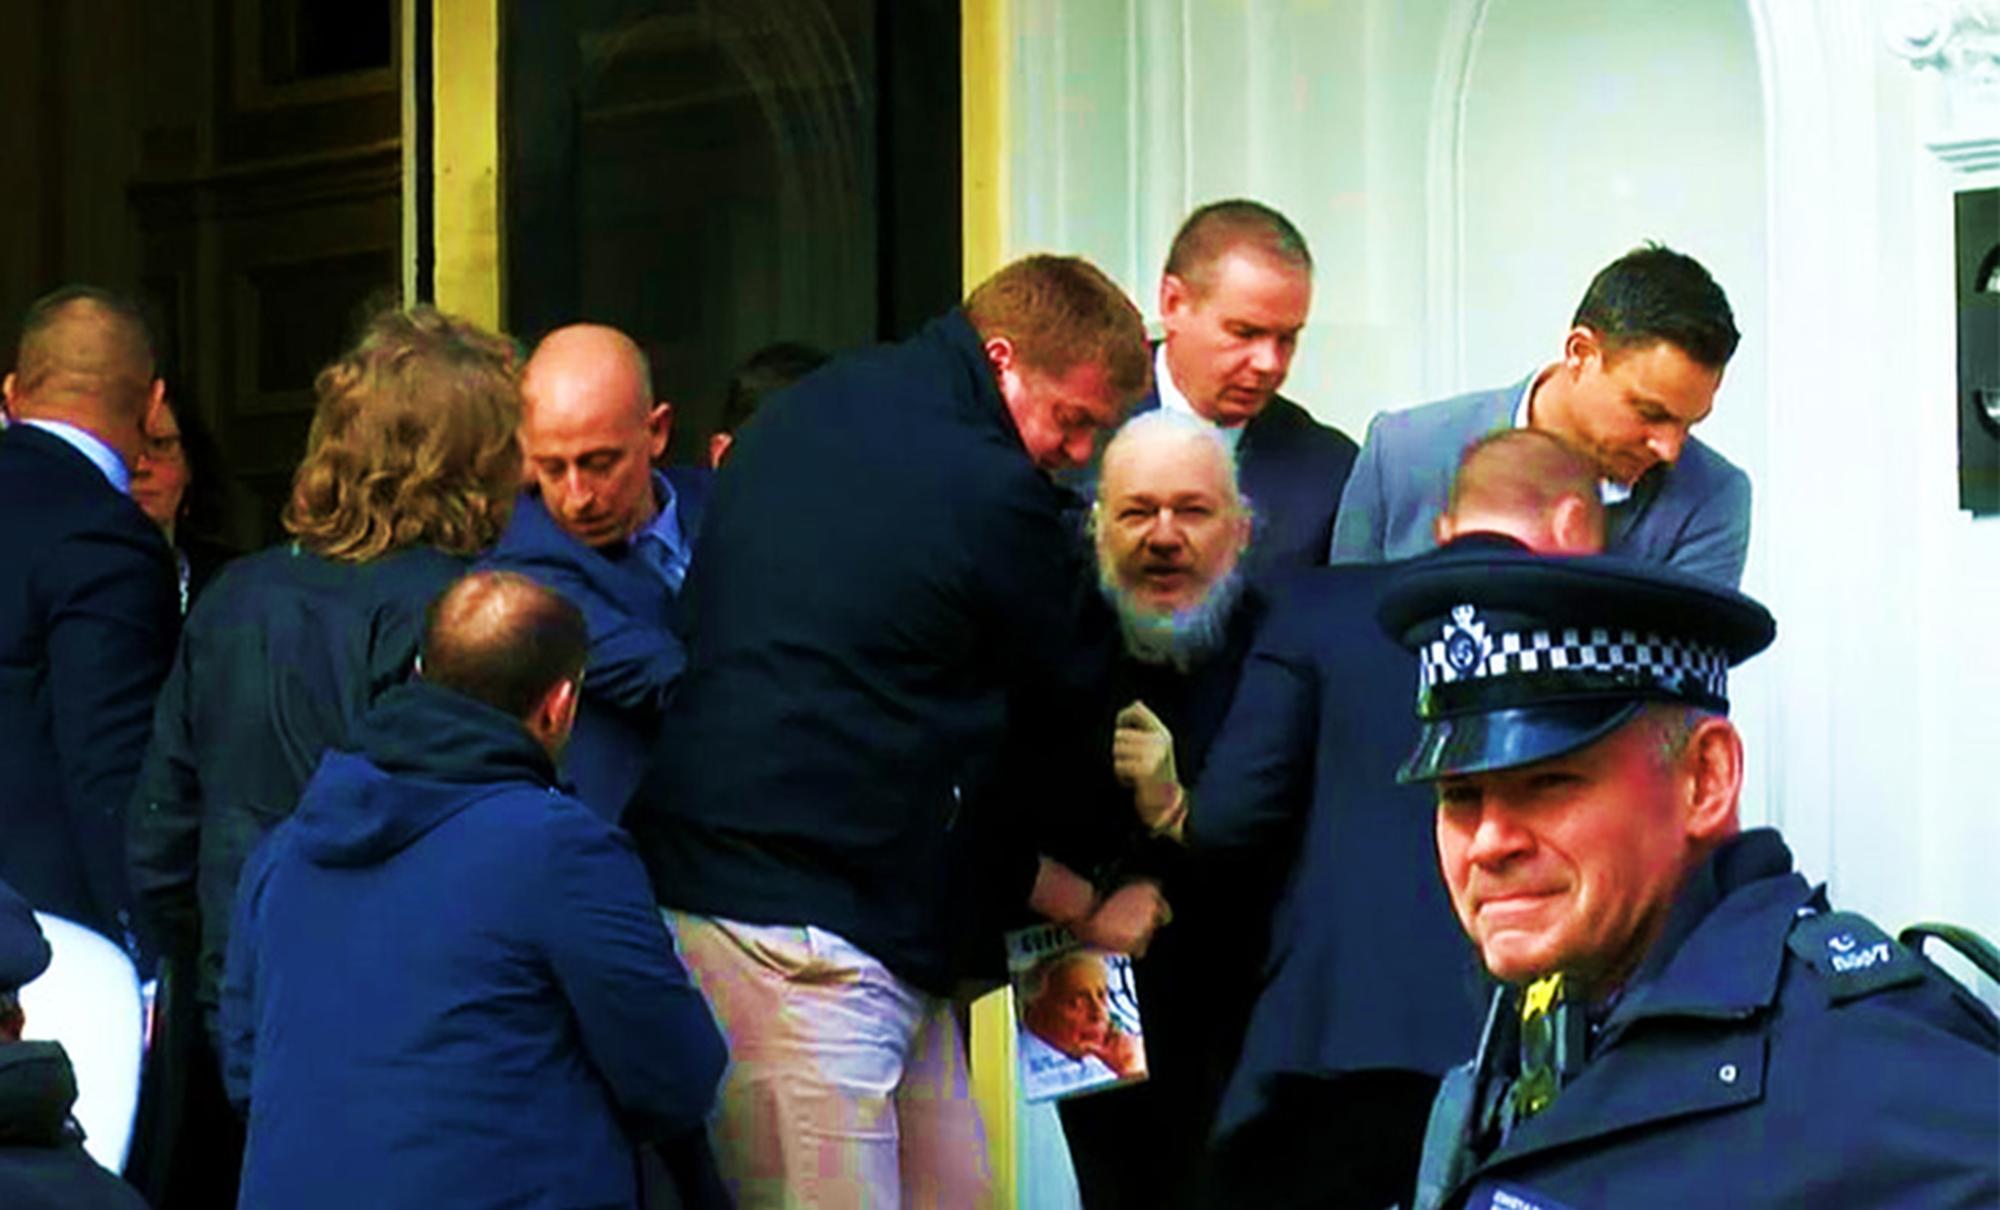 assange arrest means bad news for clinton and obama -